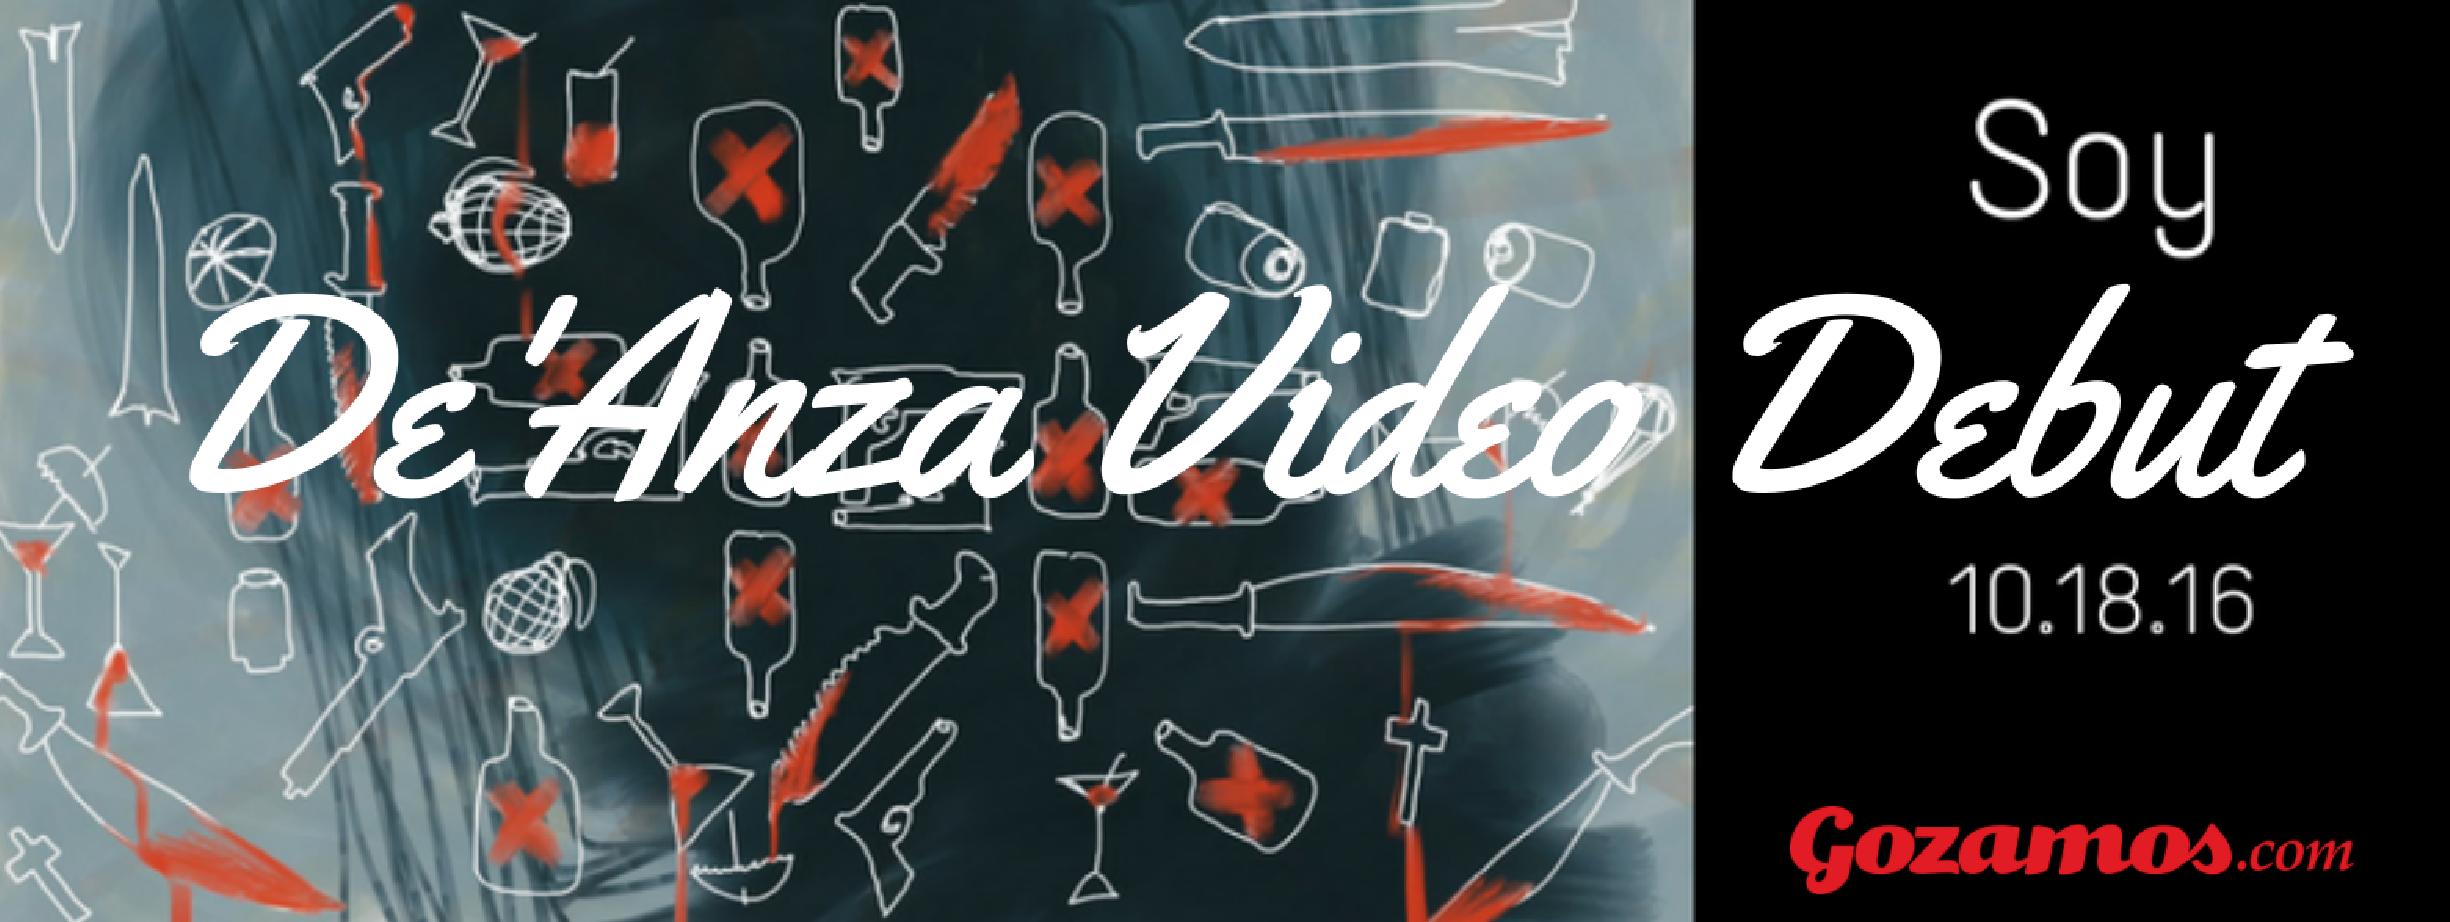 deanza-video-debut